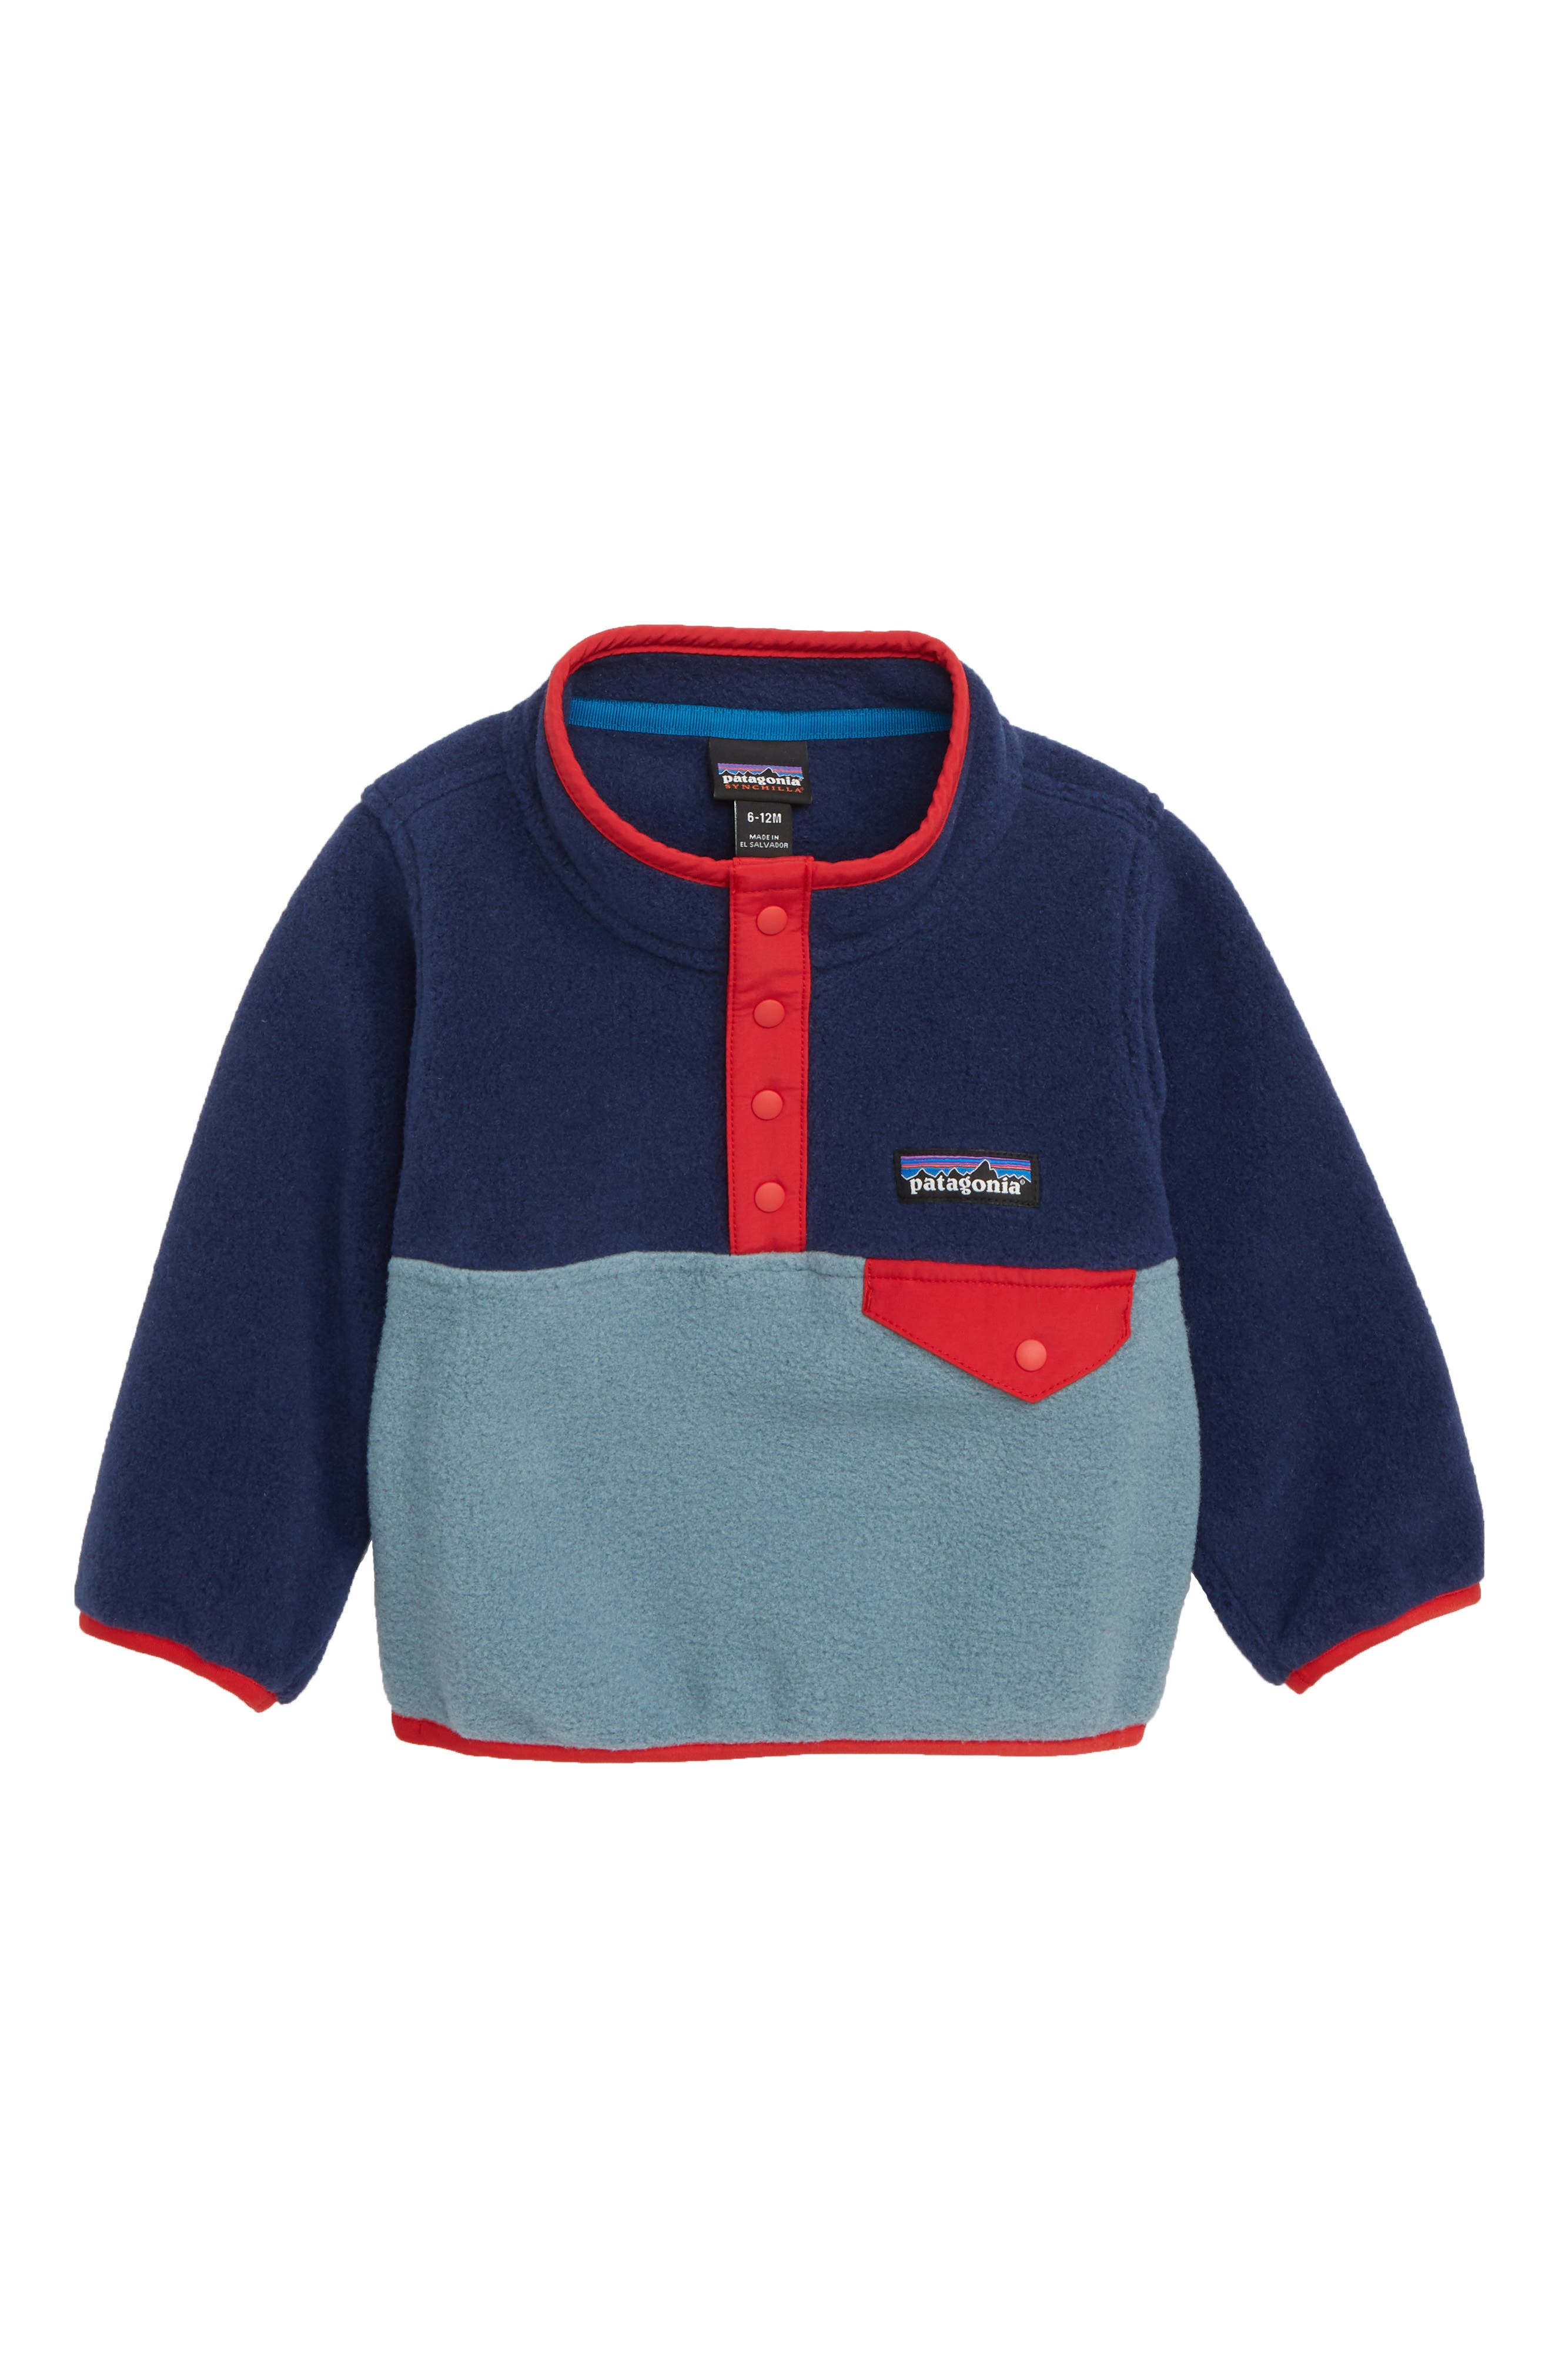 Synchilla<sup>®</sup> Snap-T<sup>®</sup> Fleece Pullover,                             Main thumbnail 1, color,                             SDAB